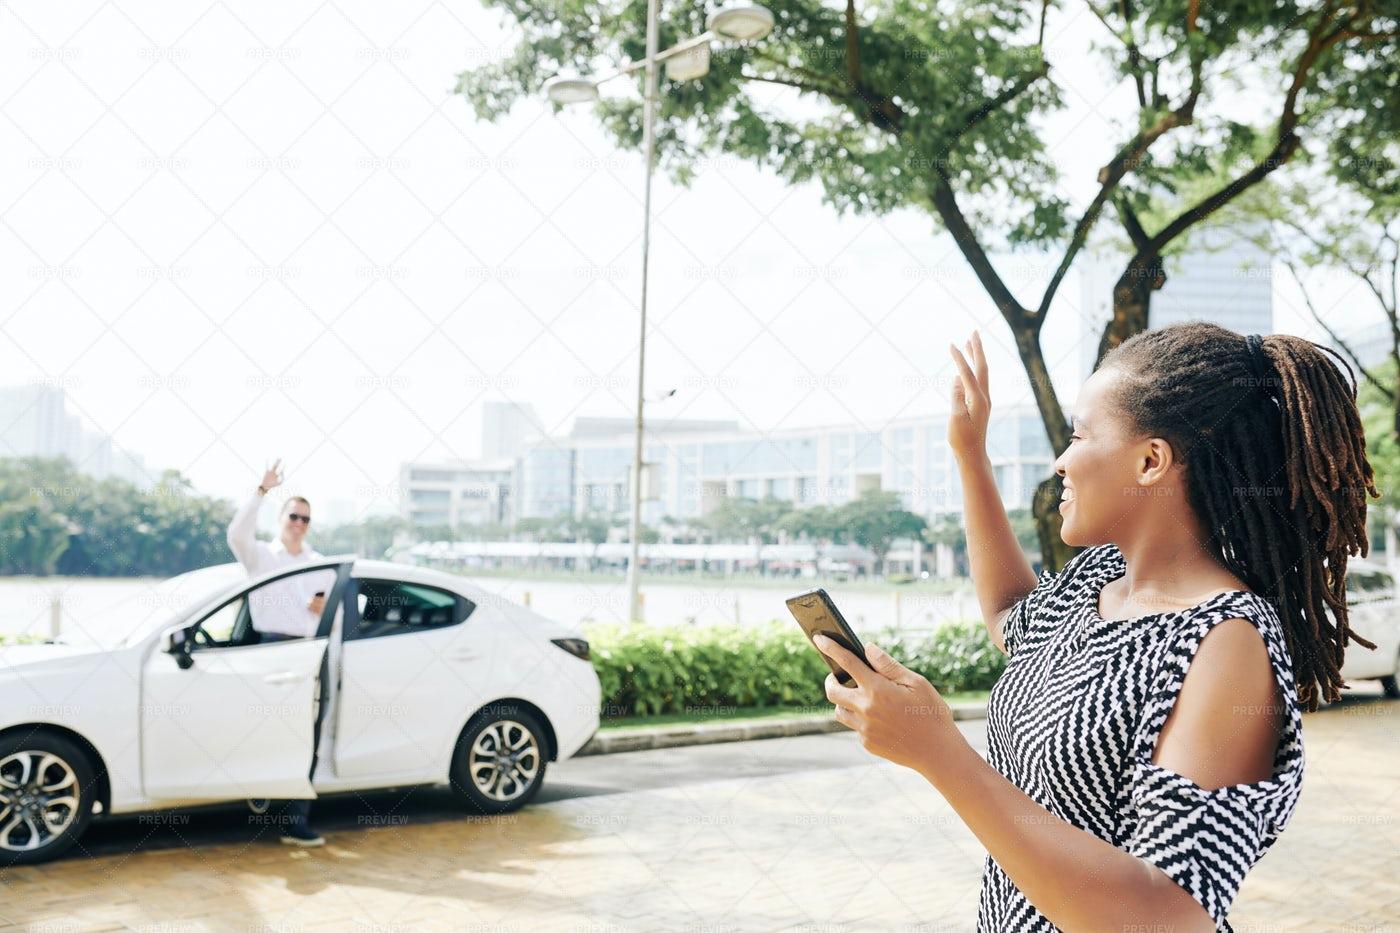 Woman Waiting For A Taxi: Stock Photos